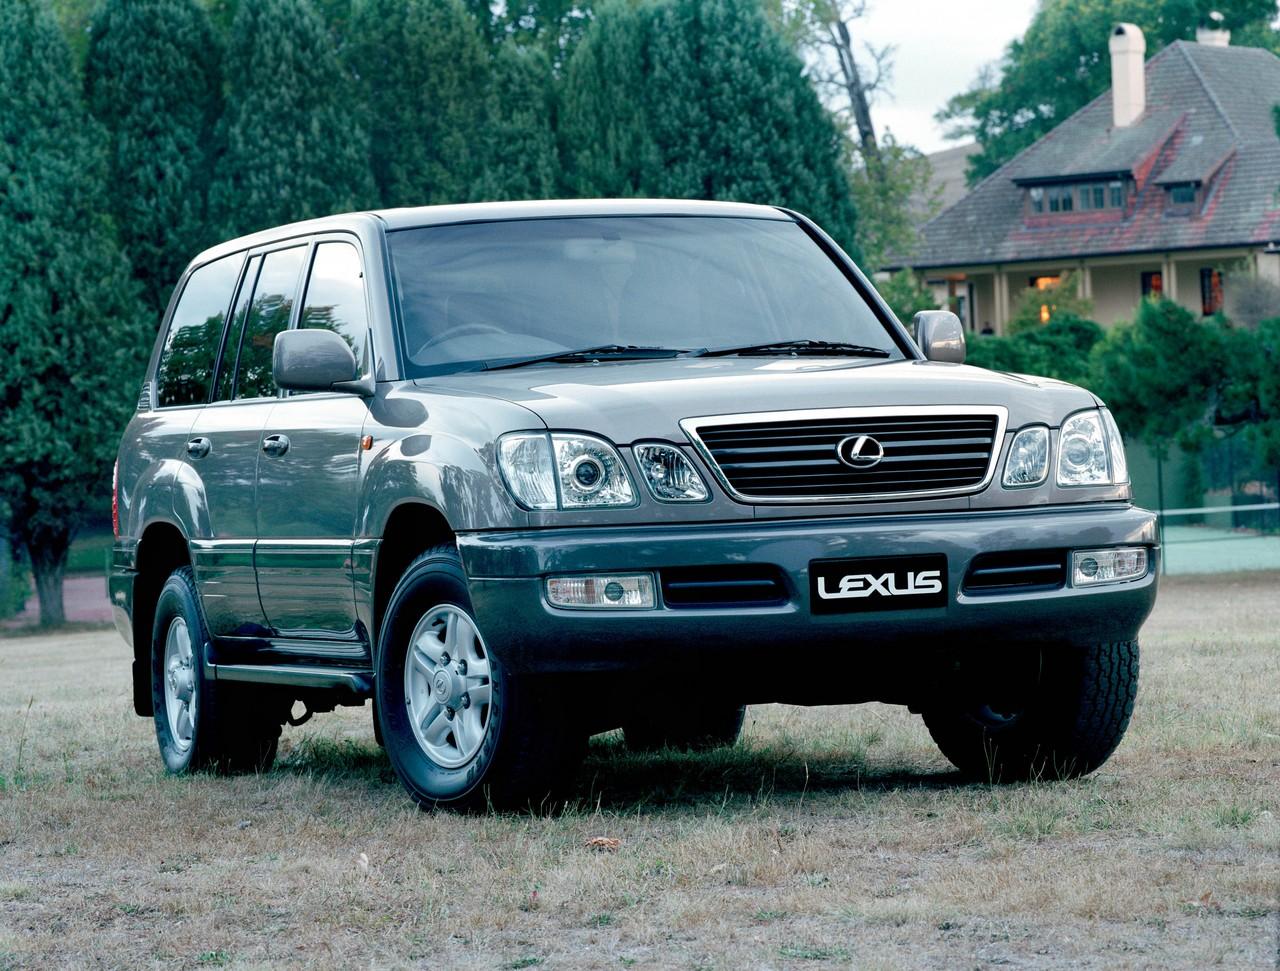 Lexus 100 series